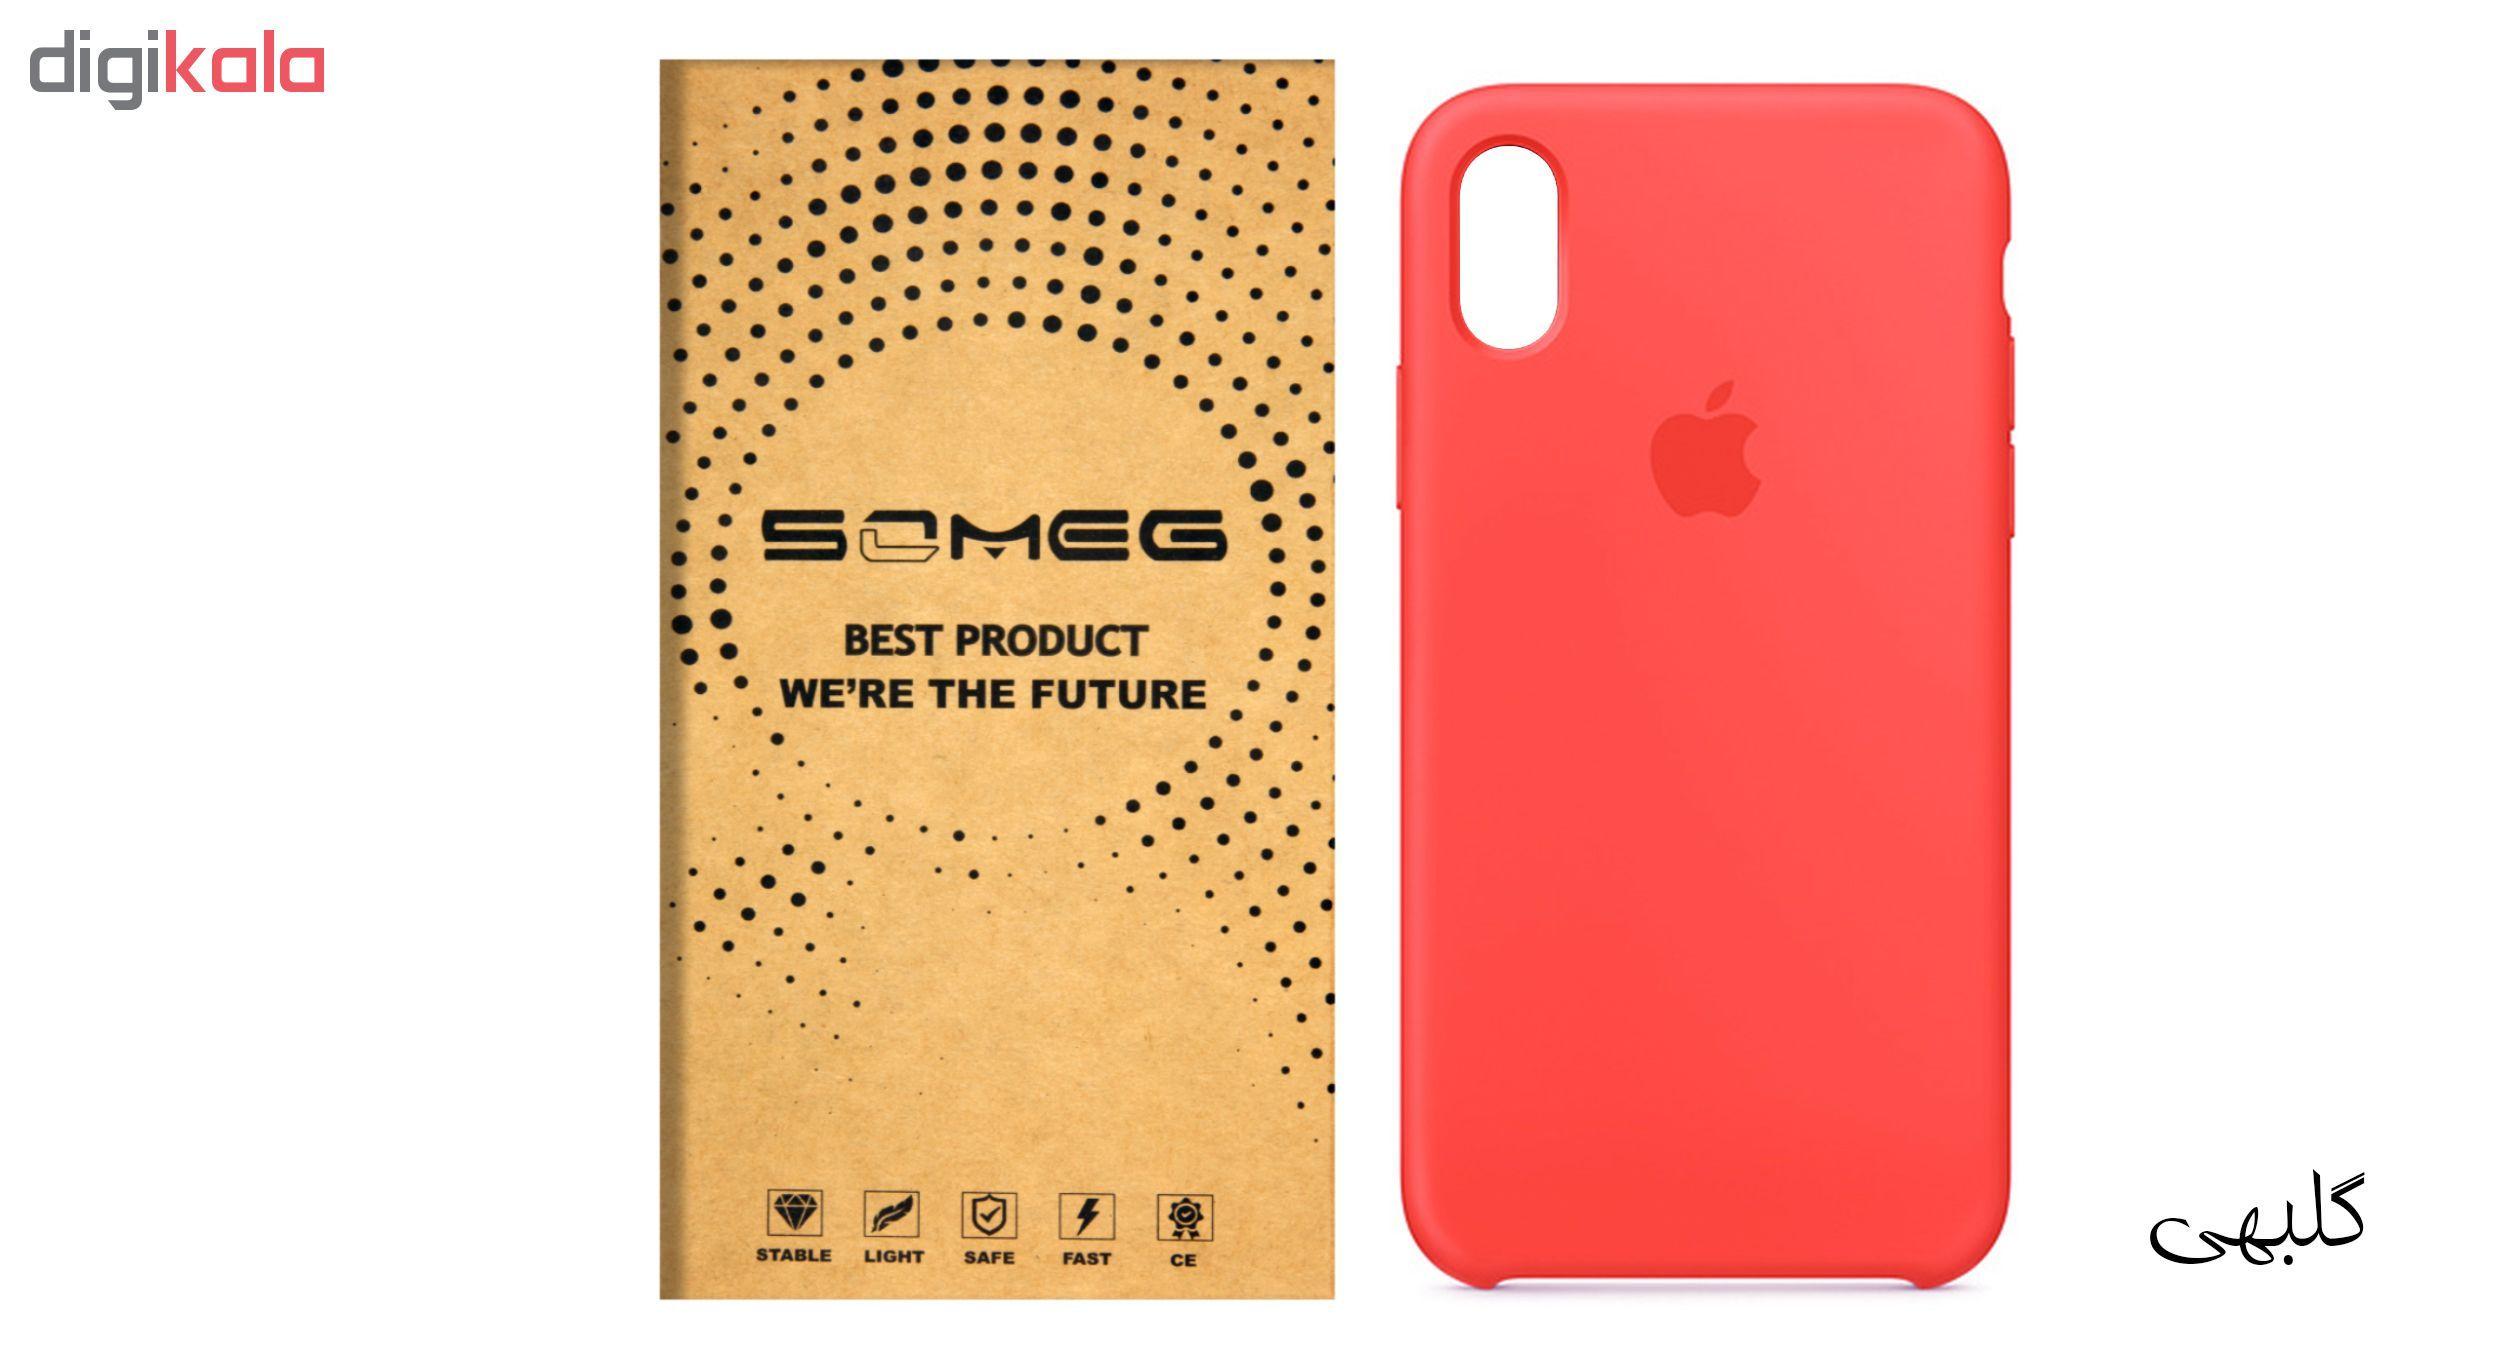 کاور سومگ مدل SIC مناسب برای گوشی موبایل اپل iPhone X  main 1 24